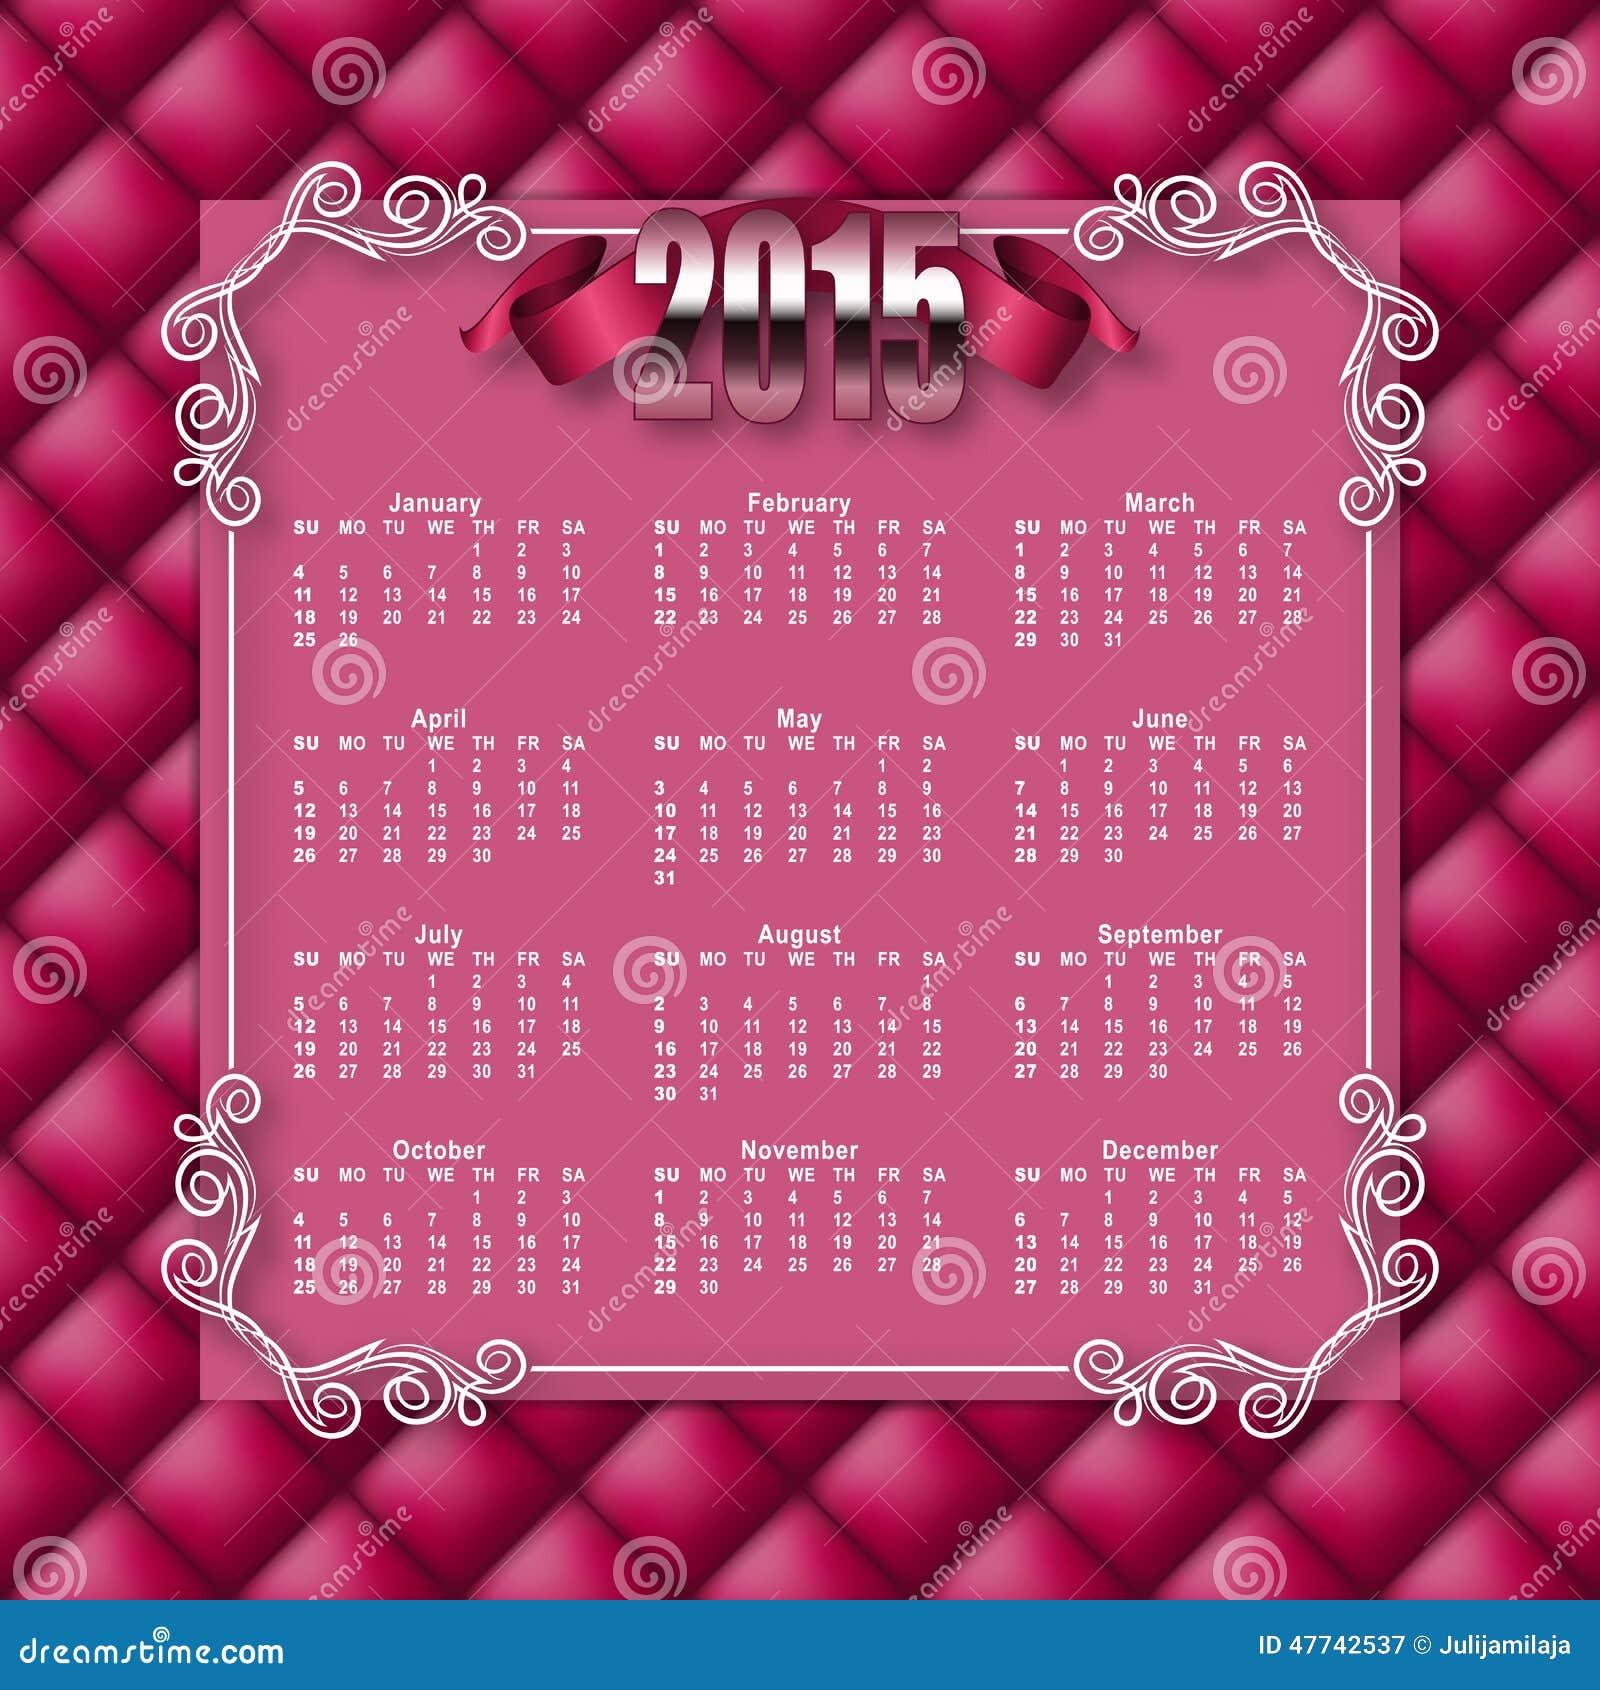 Elegant Template Of Calendar Stock Image Image Of Graphic